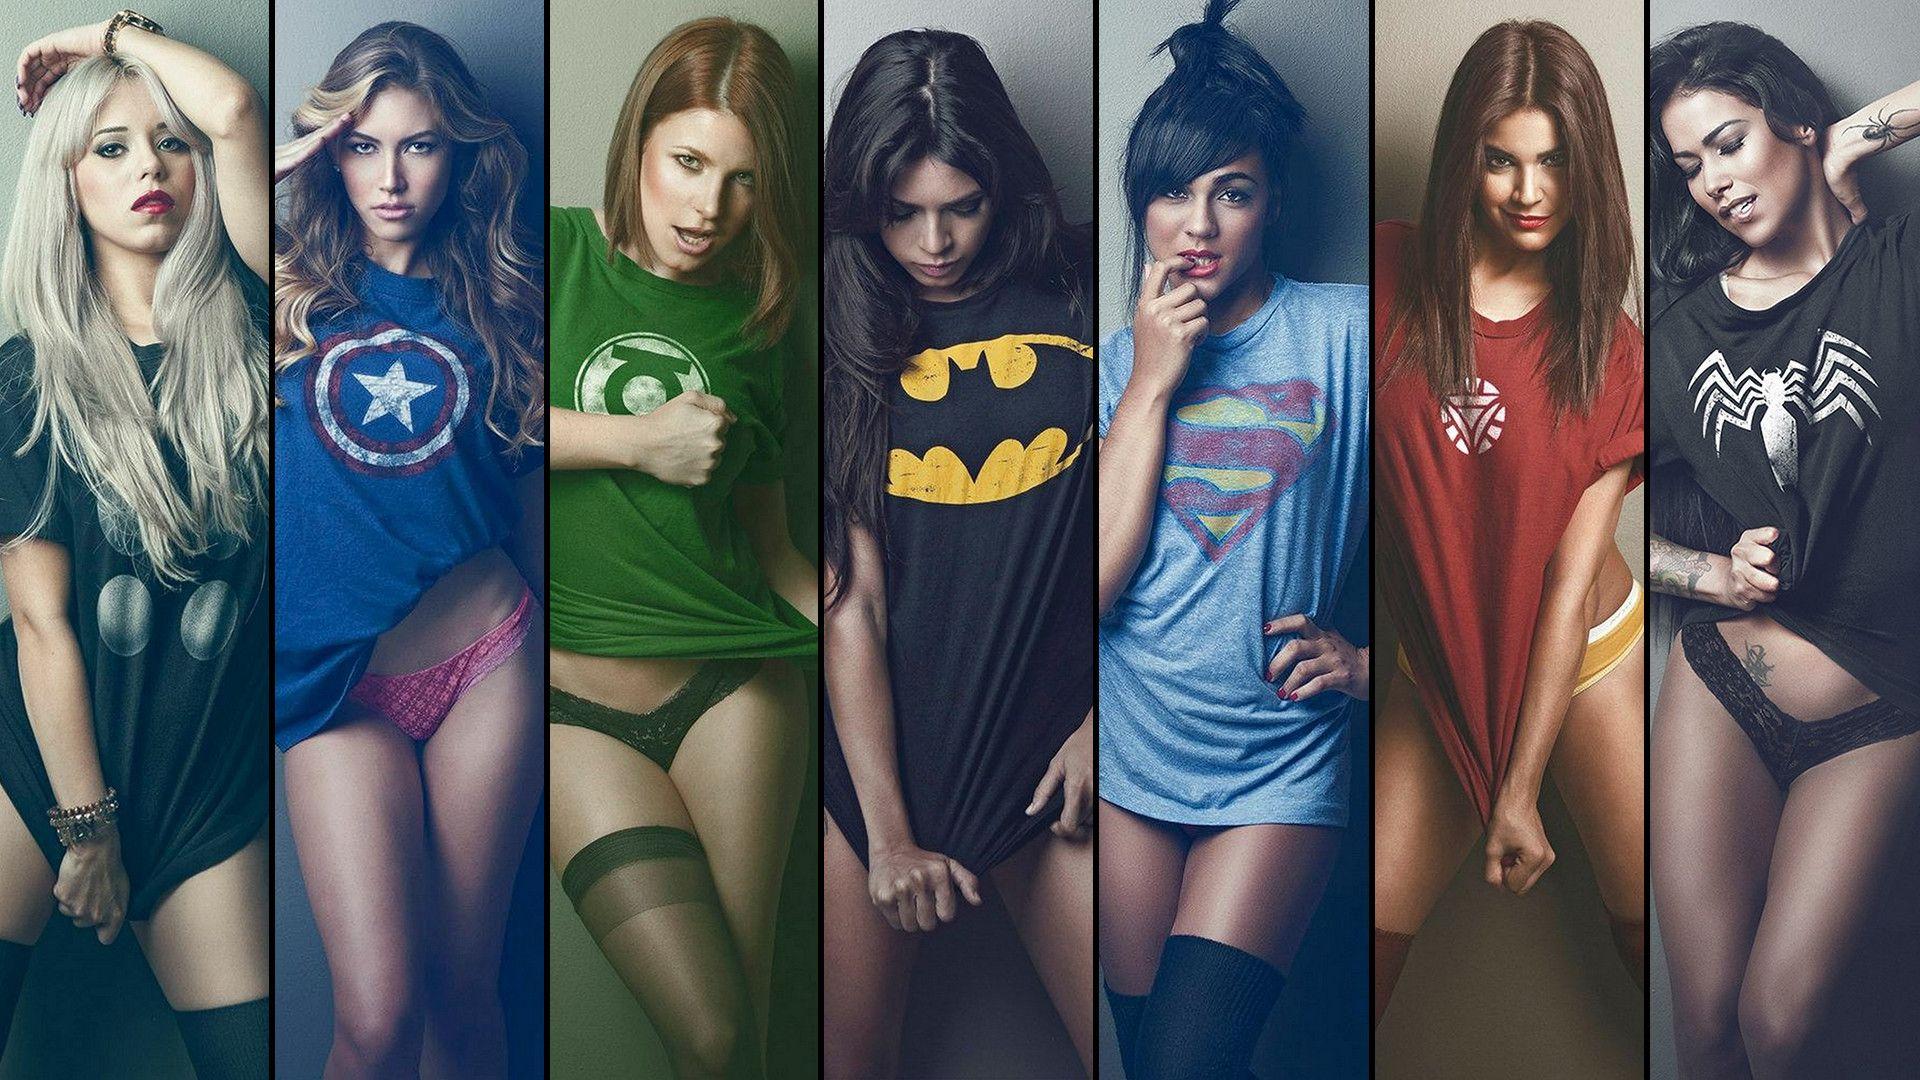 super sexy women screensaver